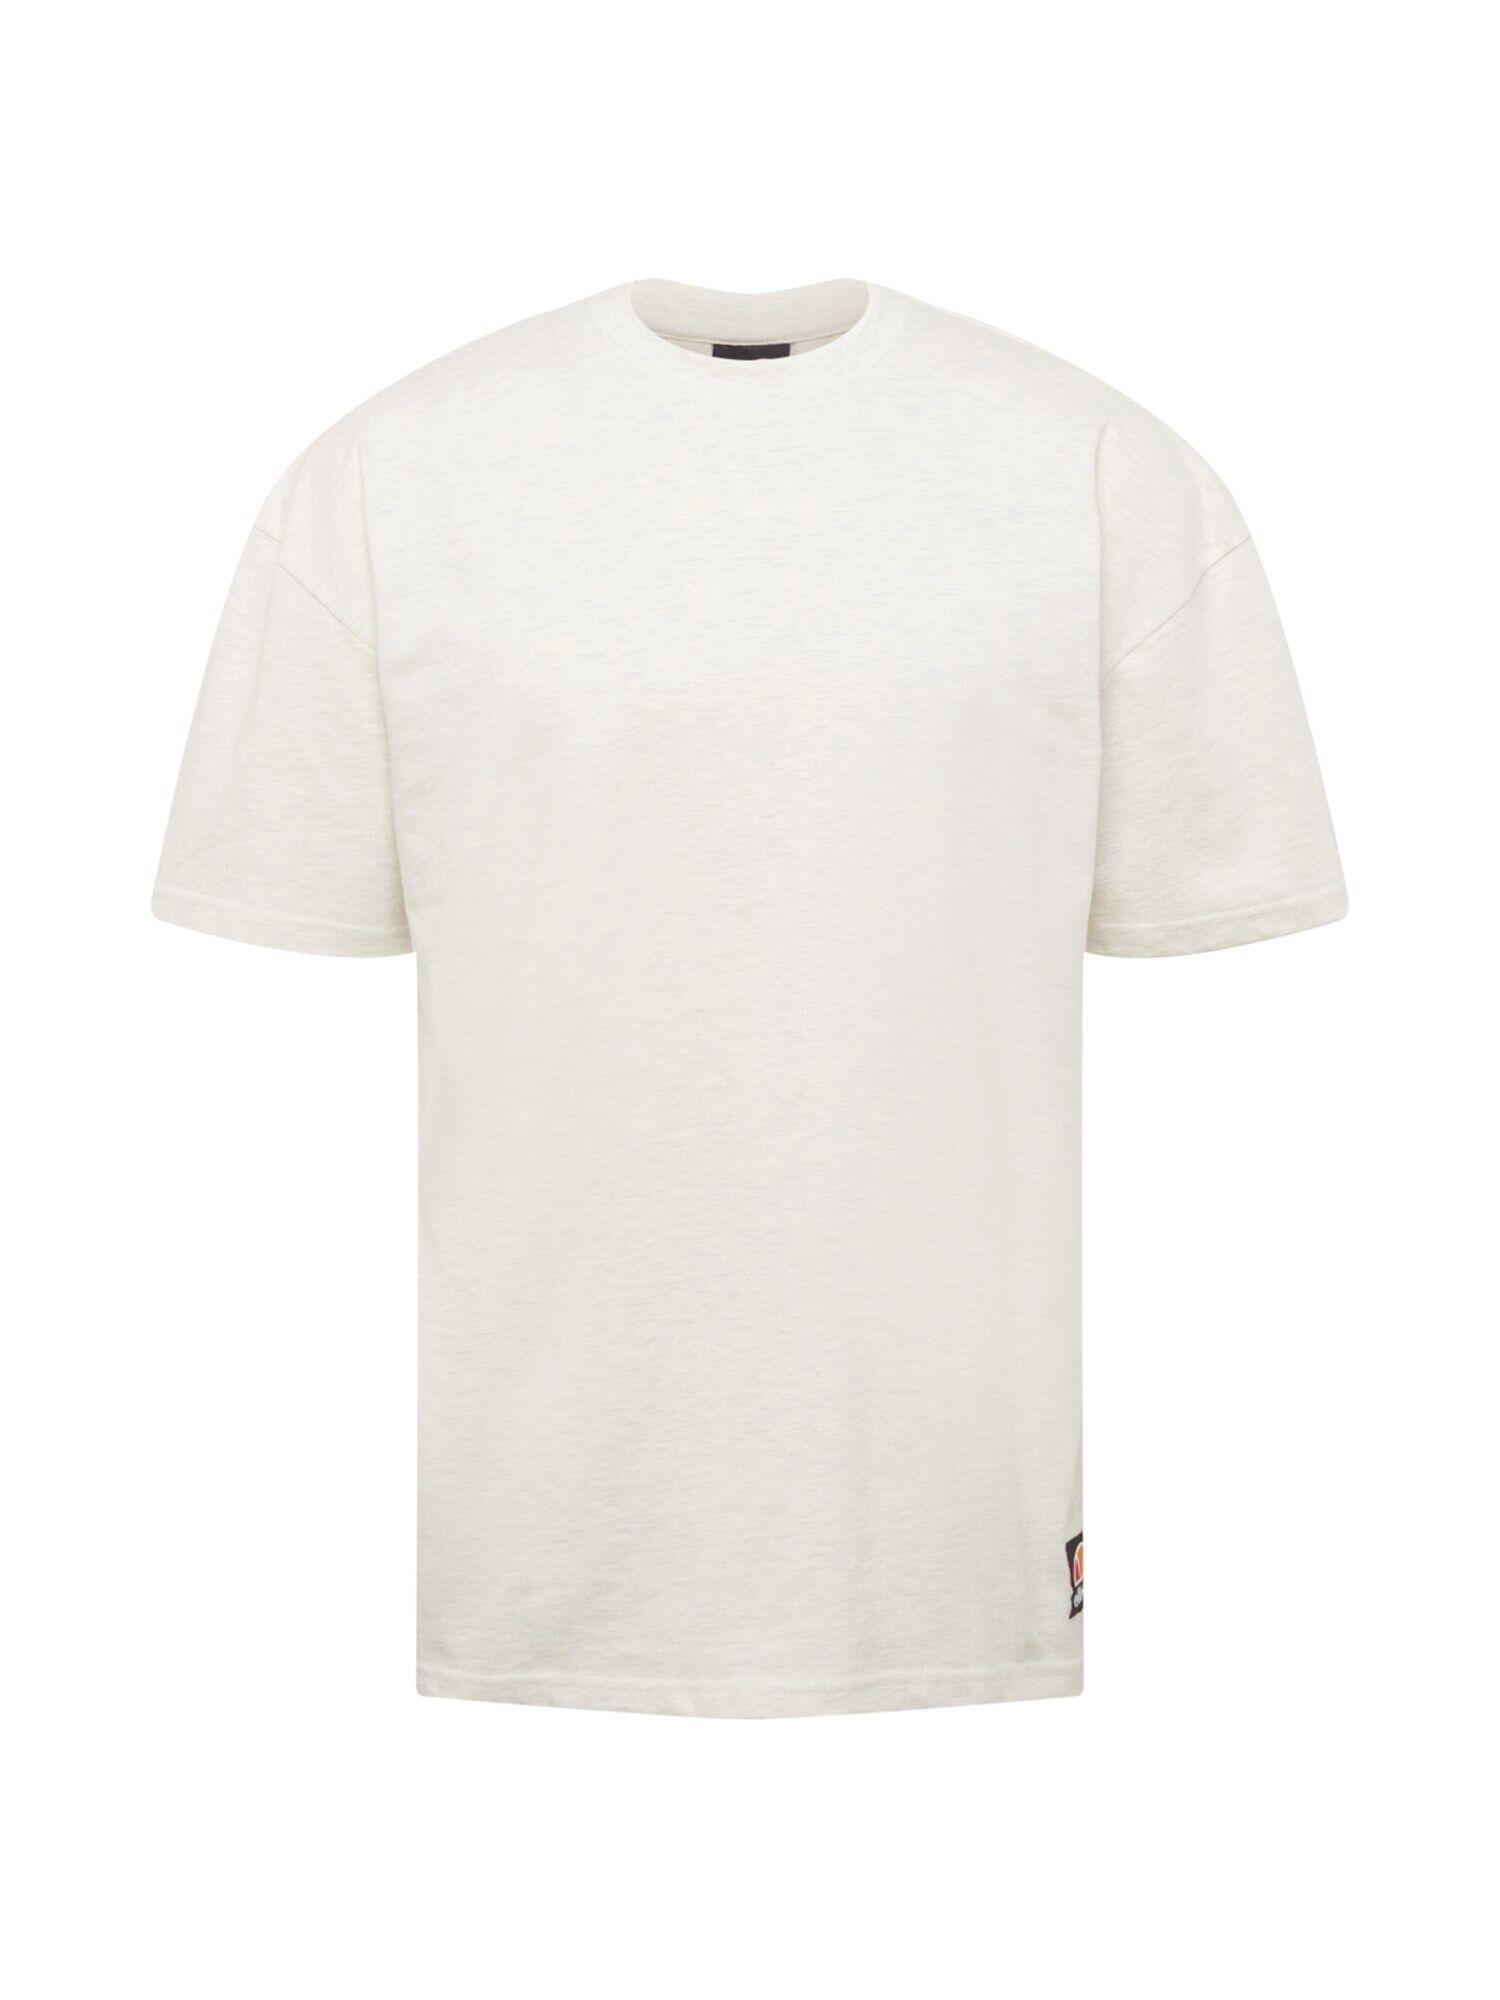 ELLESSE T-Shirt 'Avis'  - Blanc - Taille: S - male